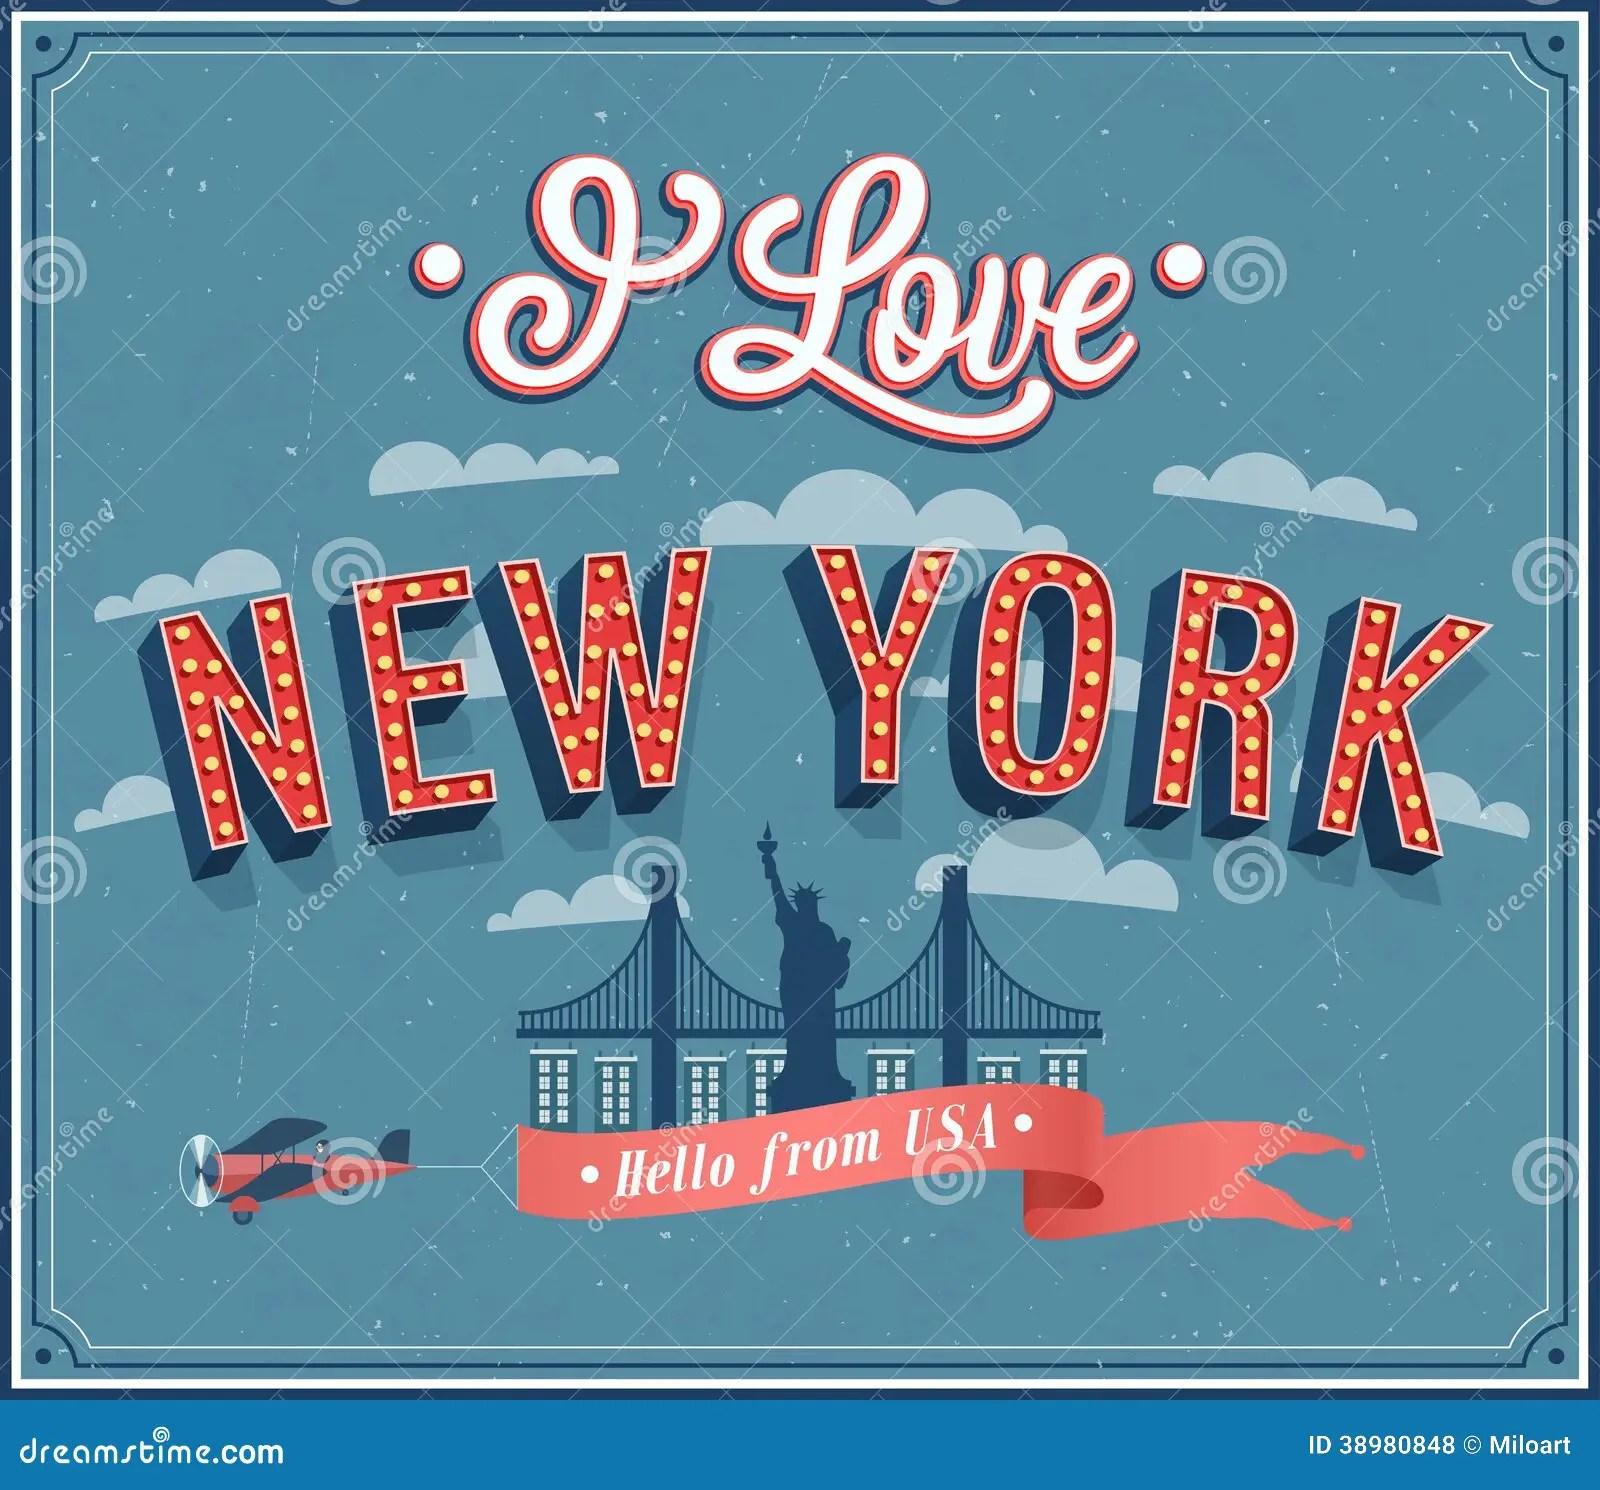 Greetings New York City